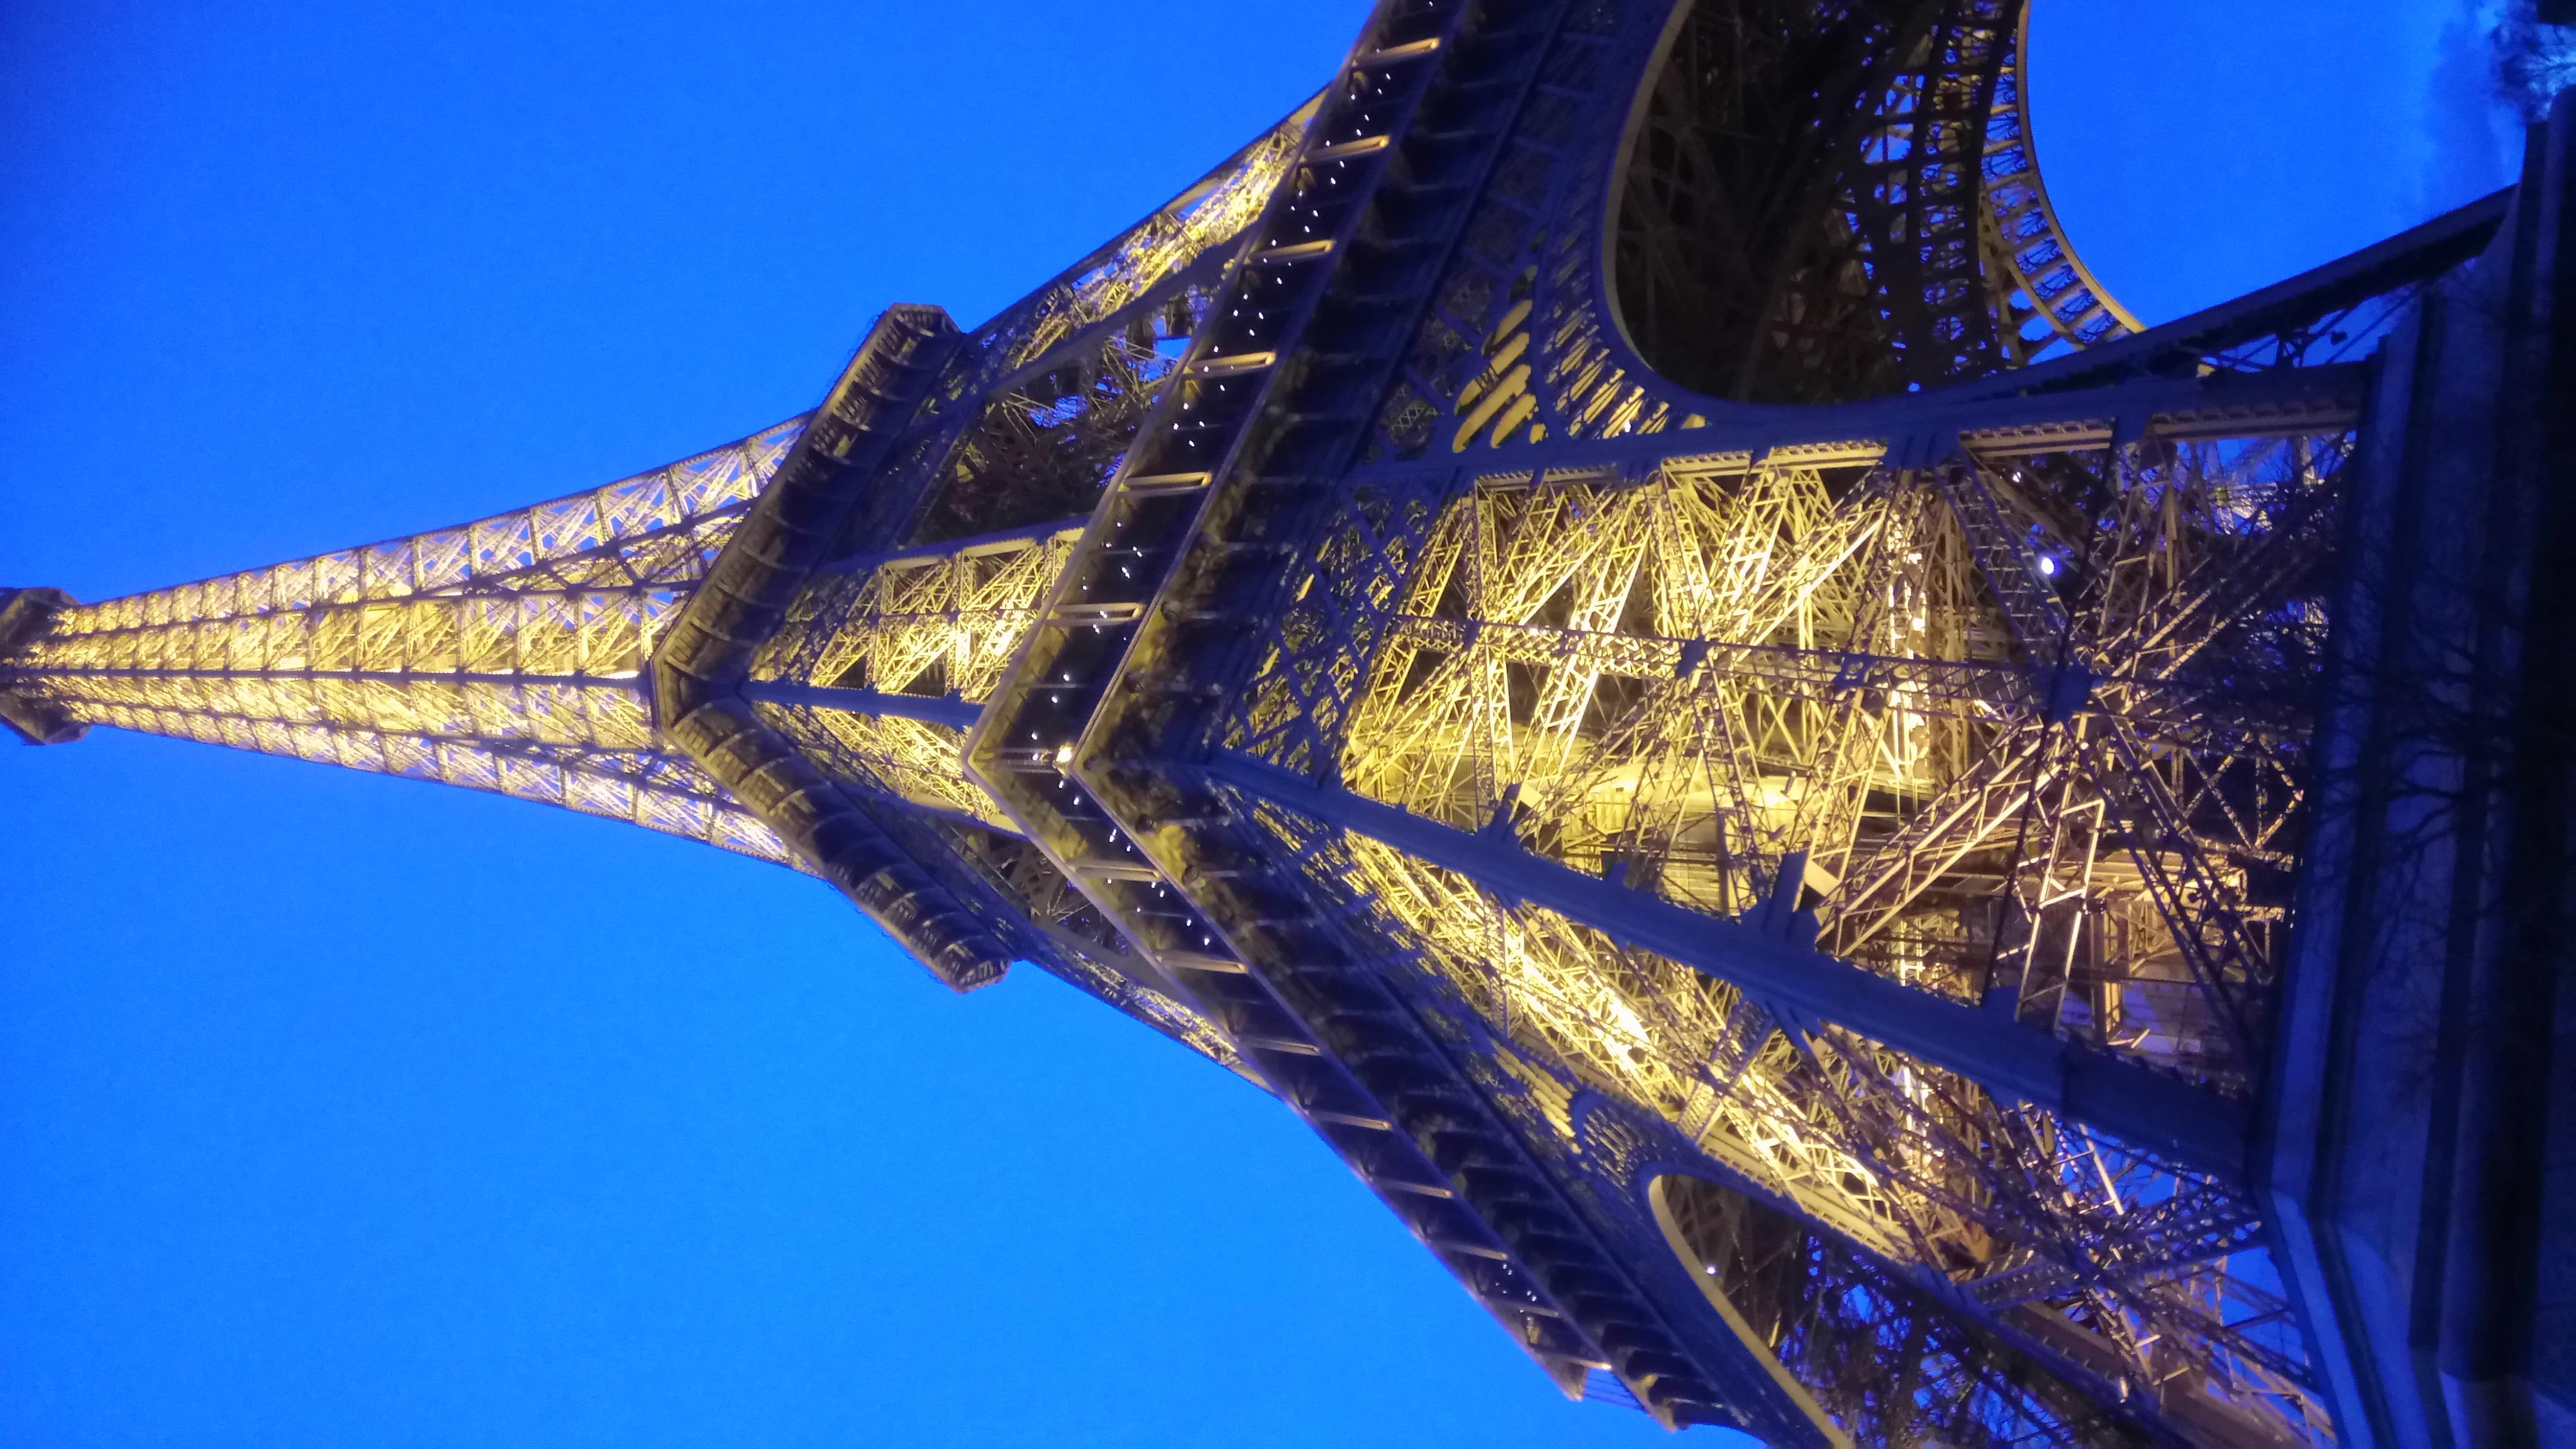 Archivo:Torre Eiffel Noche.jpg